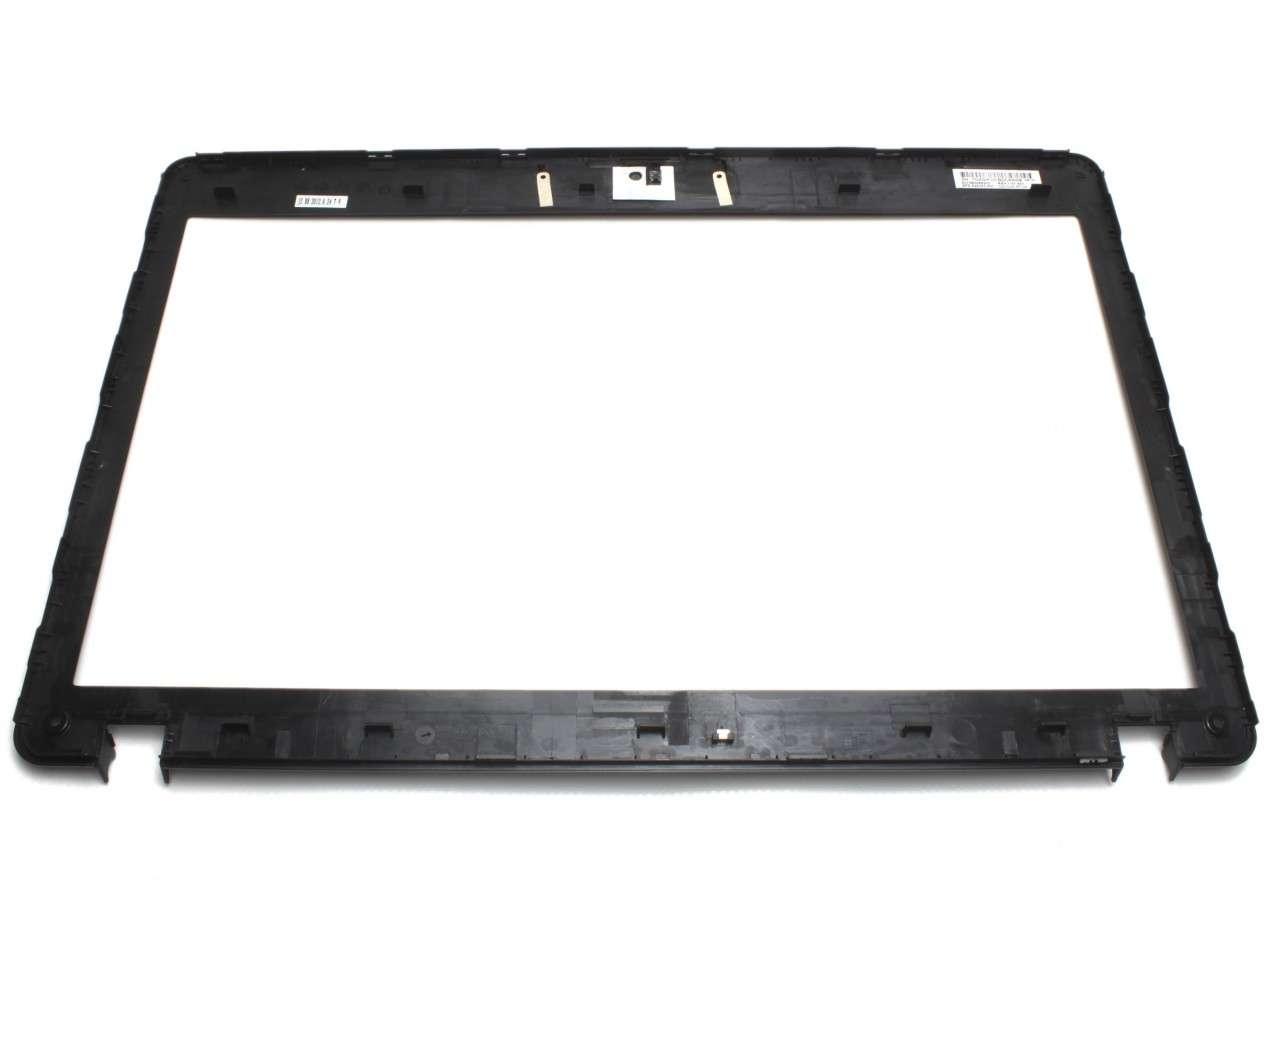 Rama Display HP 646266 001 Bezel Front Cover Neagra imagine powerlaptop.ro 2021